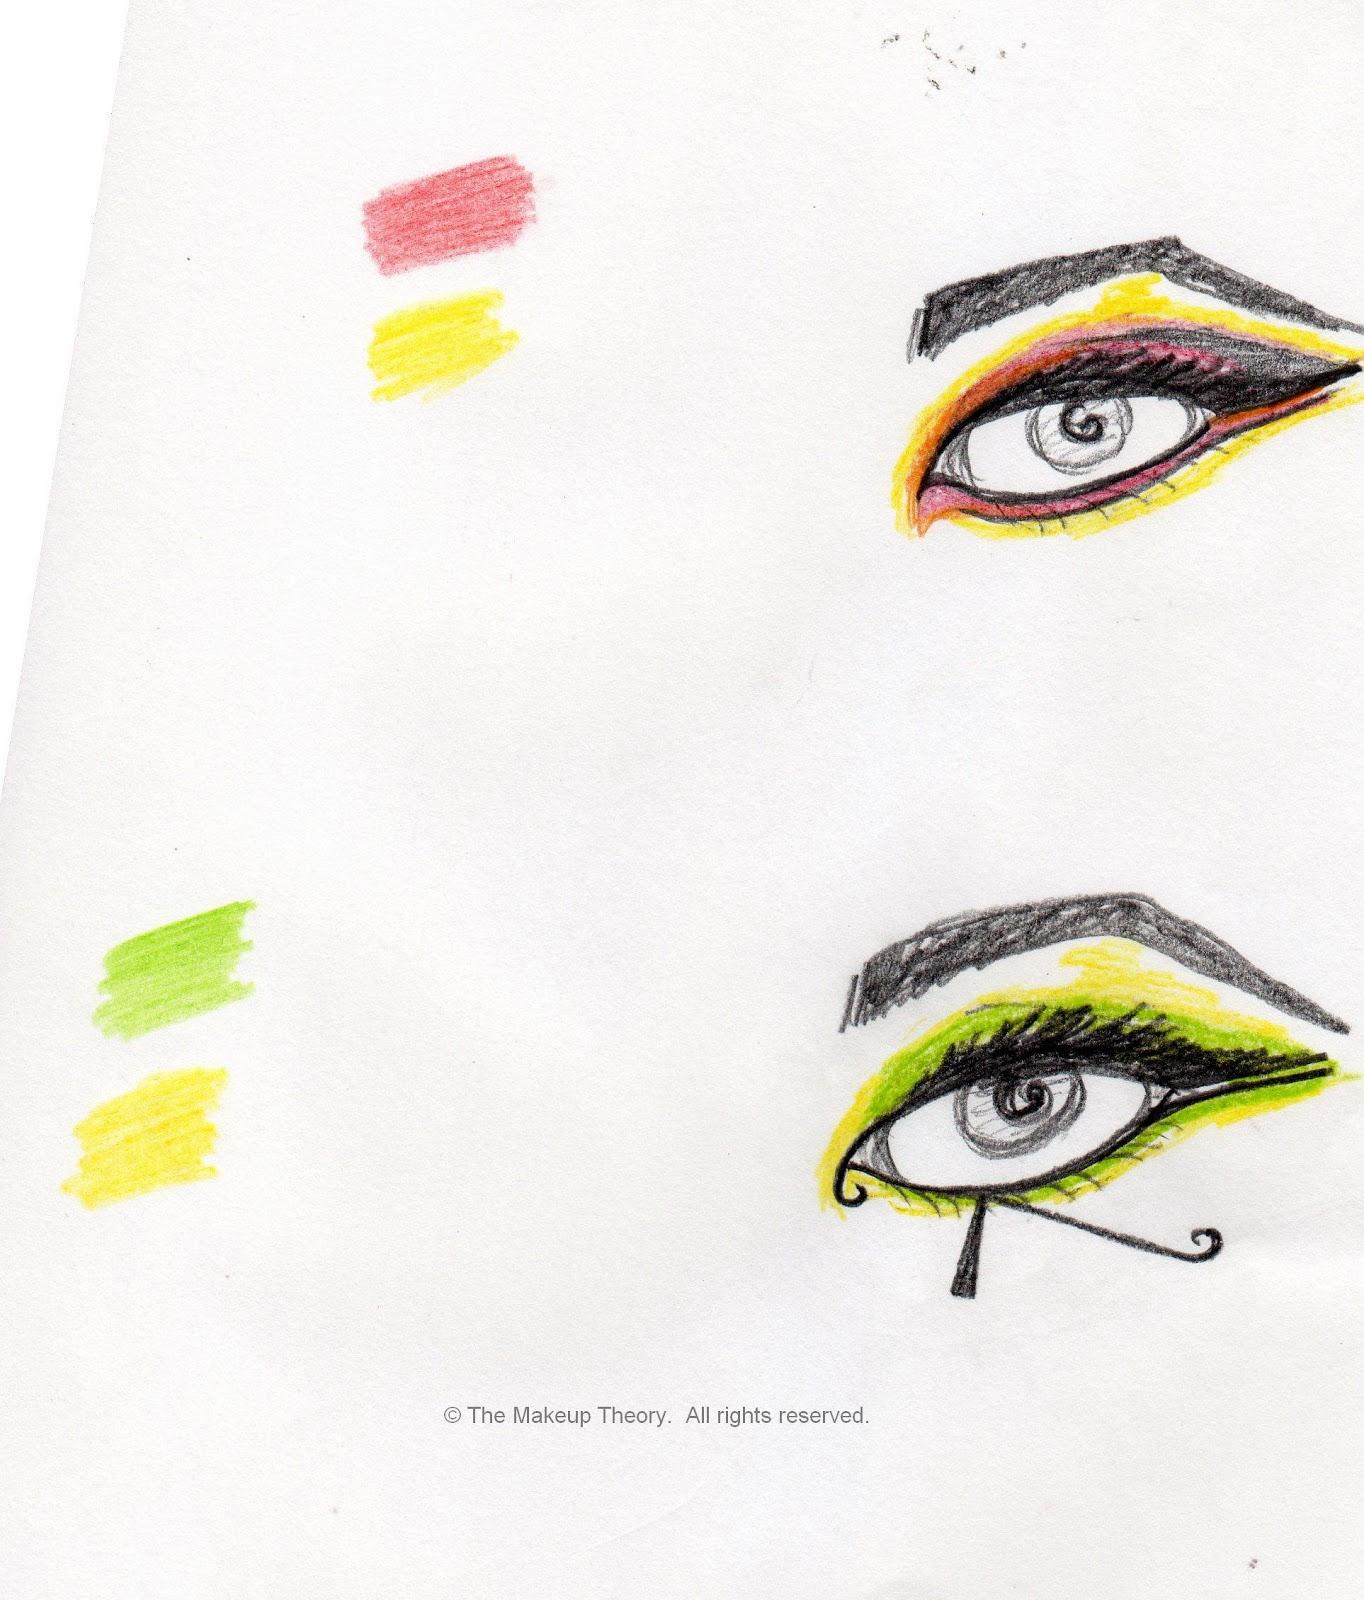 The Makeup Theory Studio